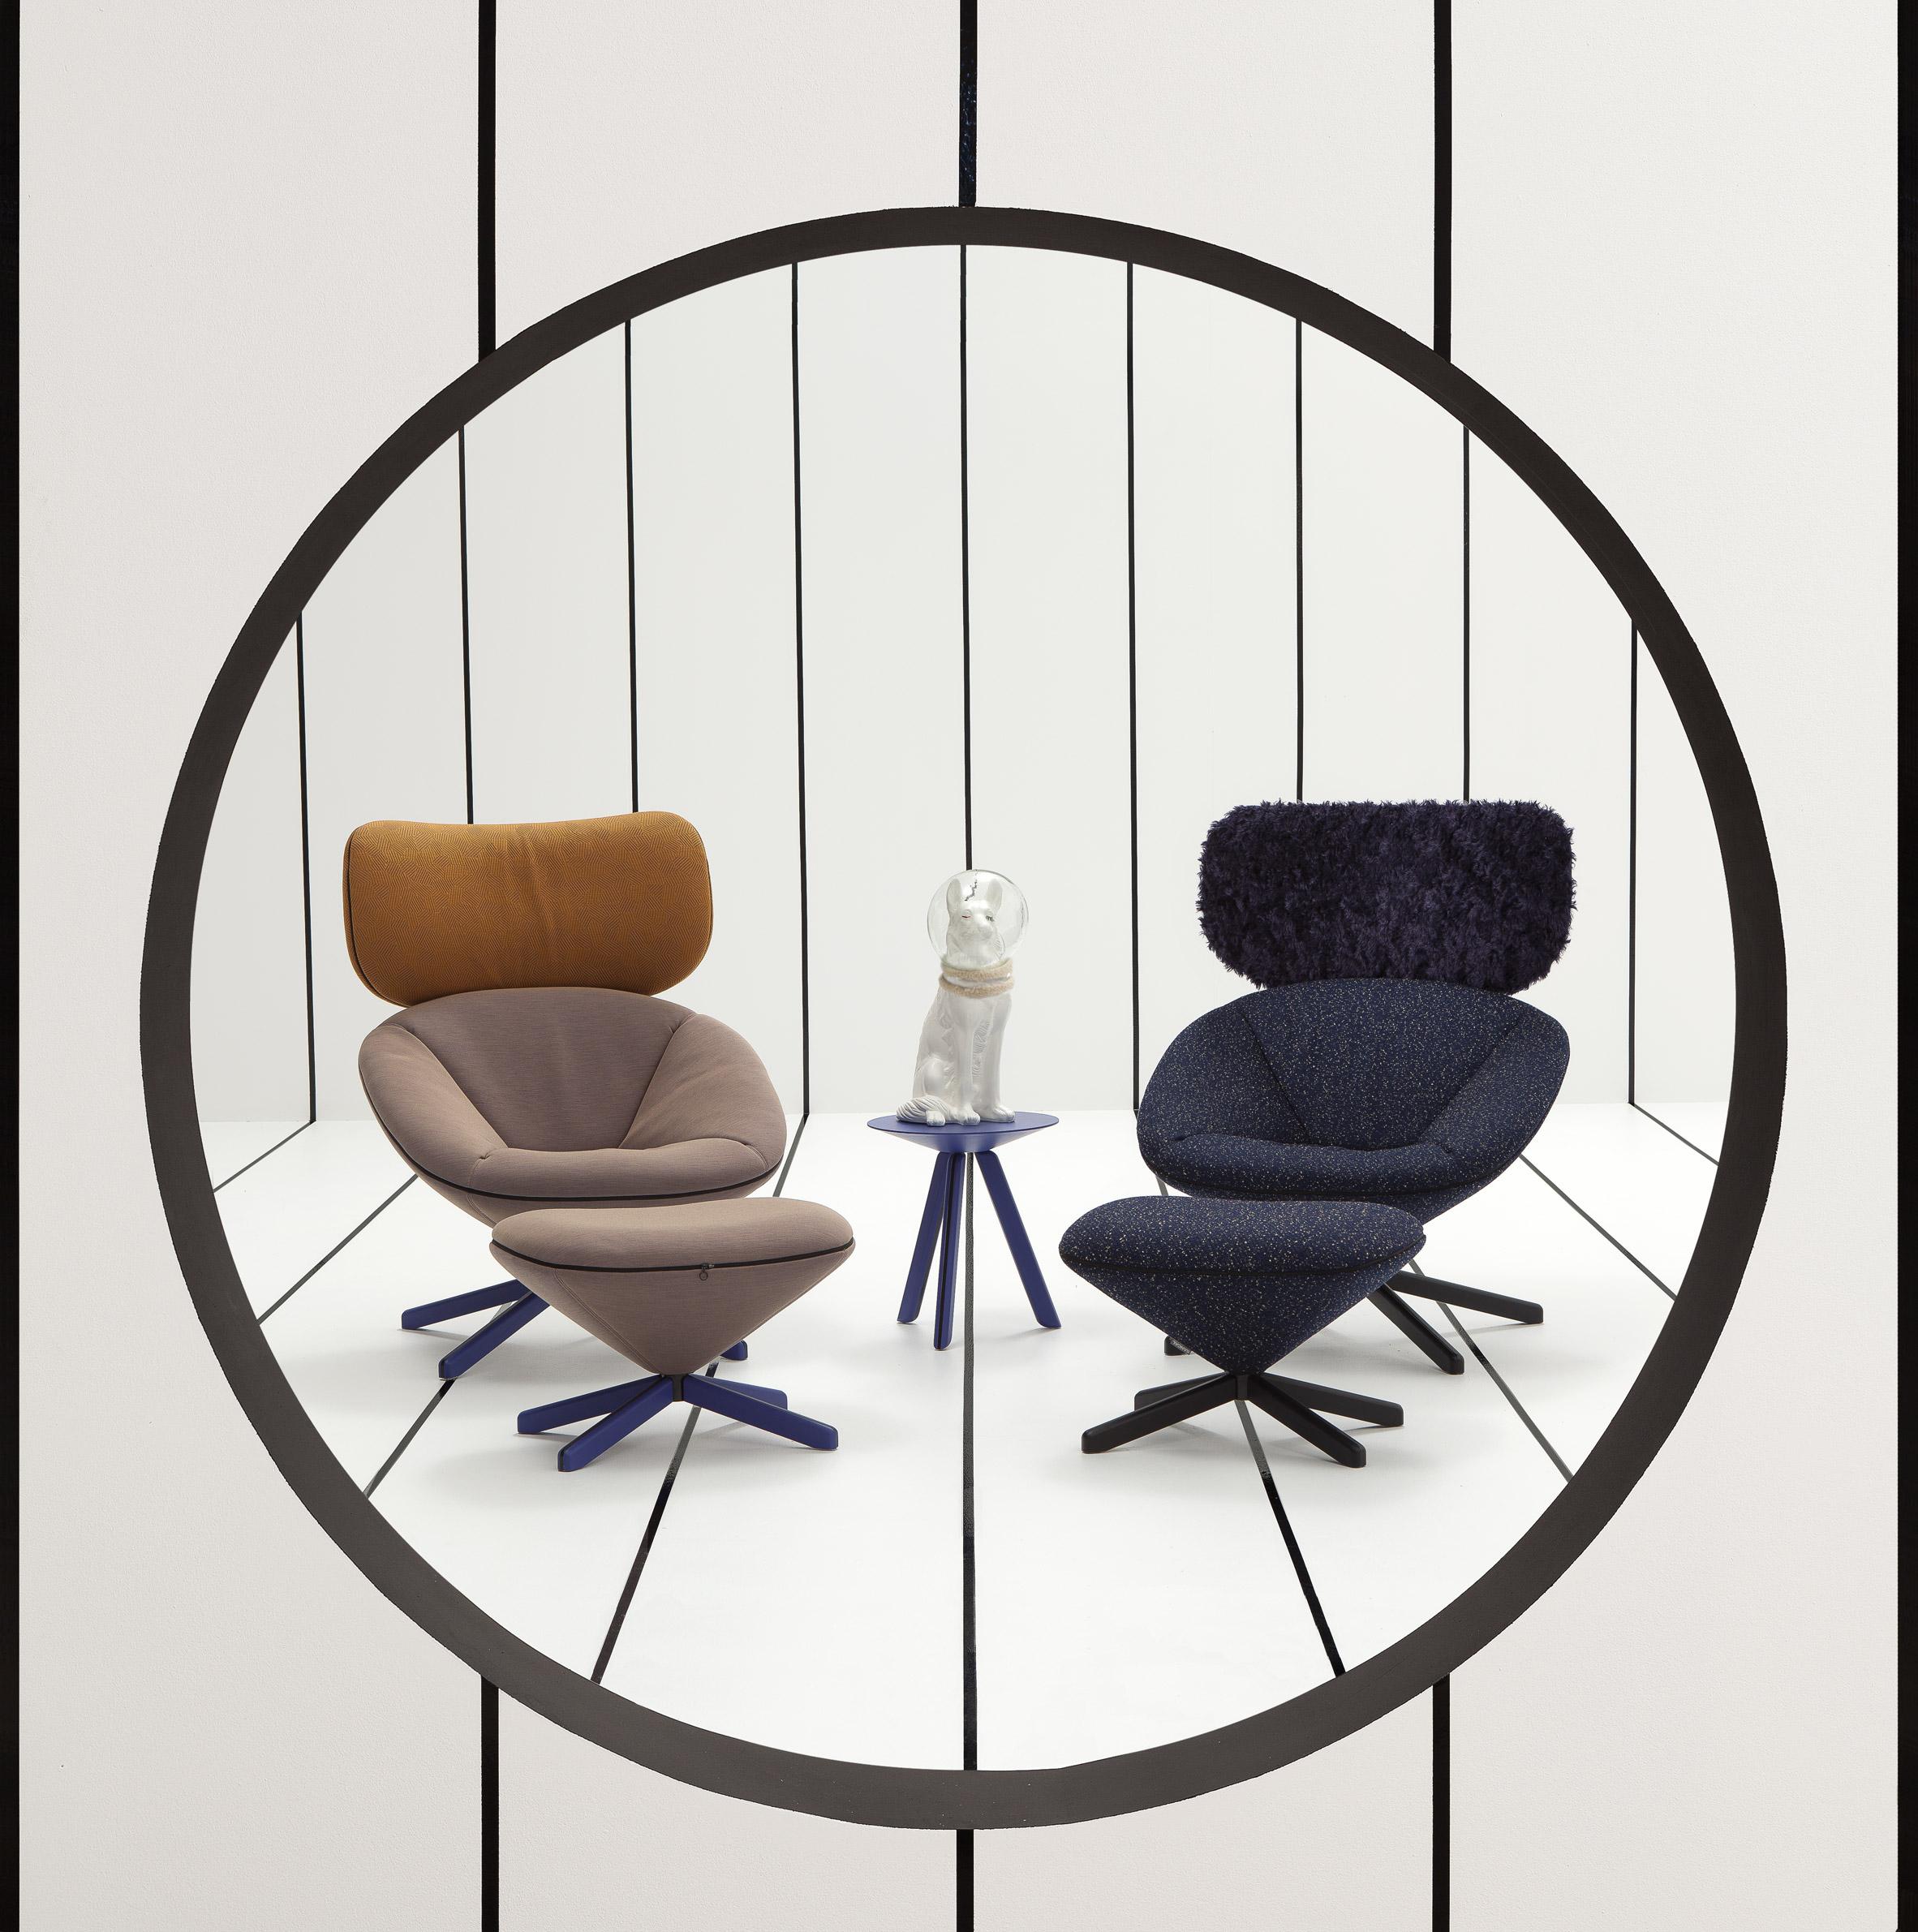 tortuga-chair-nadadora-sancal-tortoise-lounge-seat-extra_dezeen_2364_col_5-1